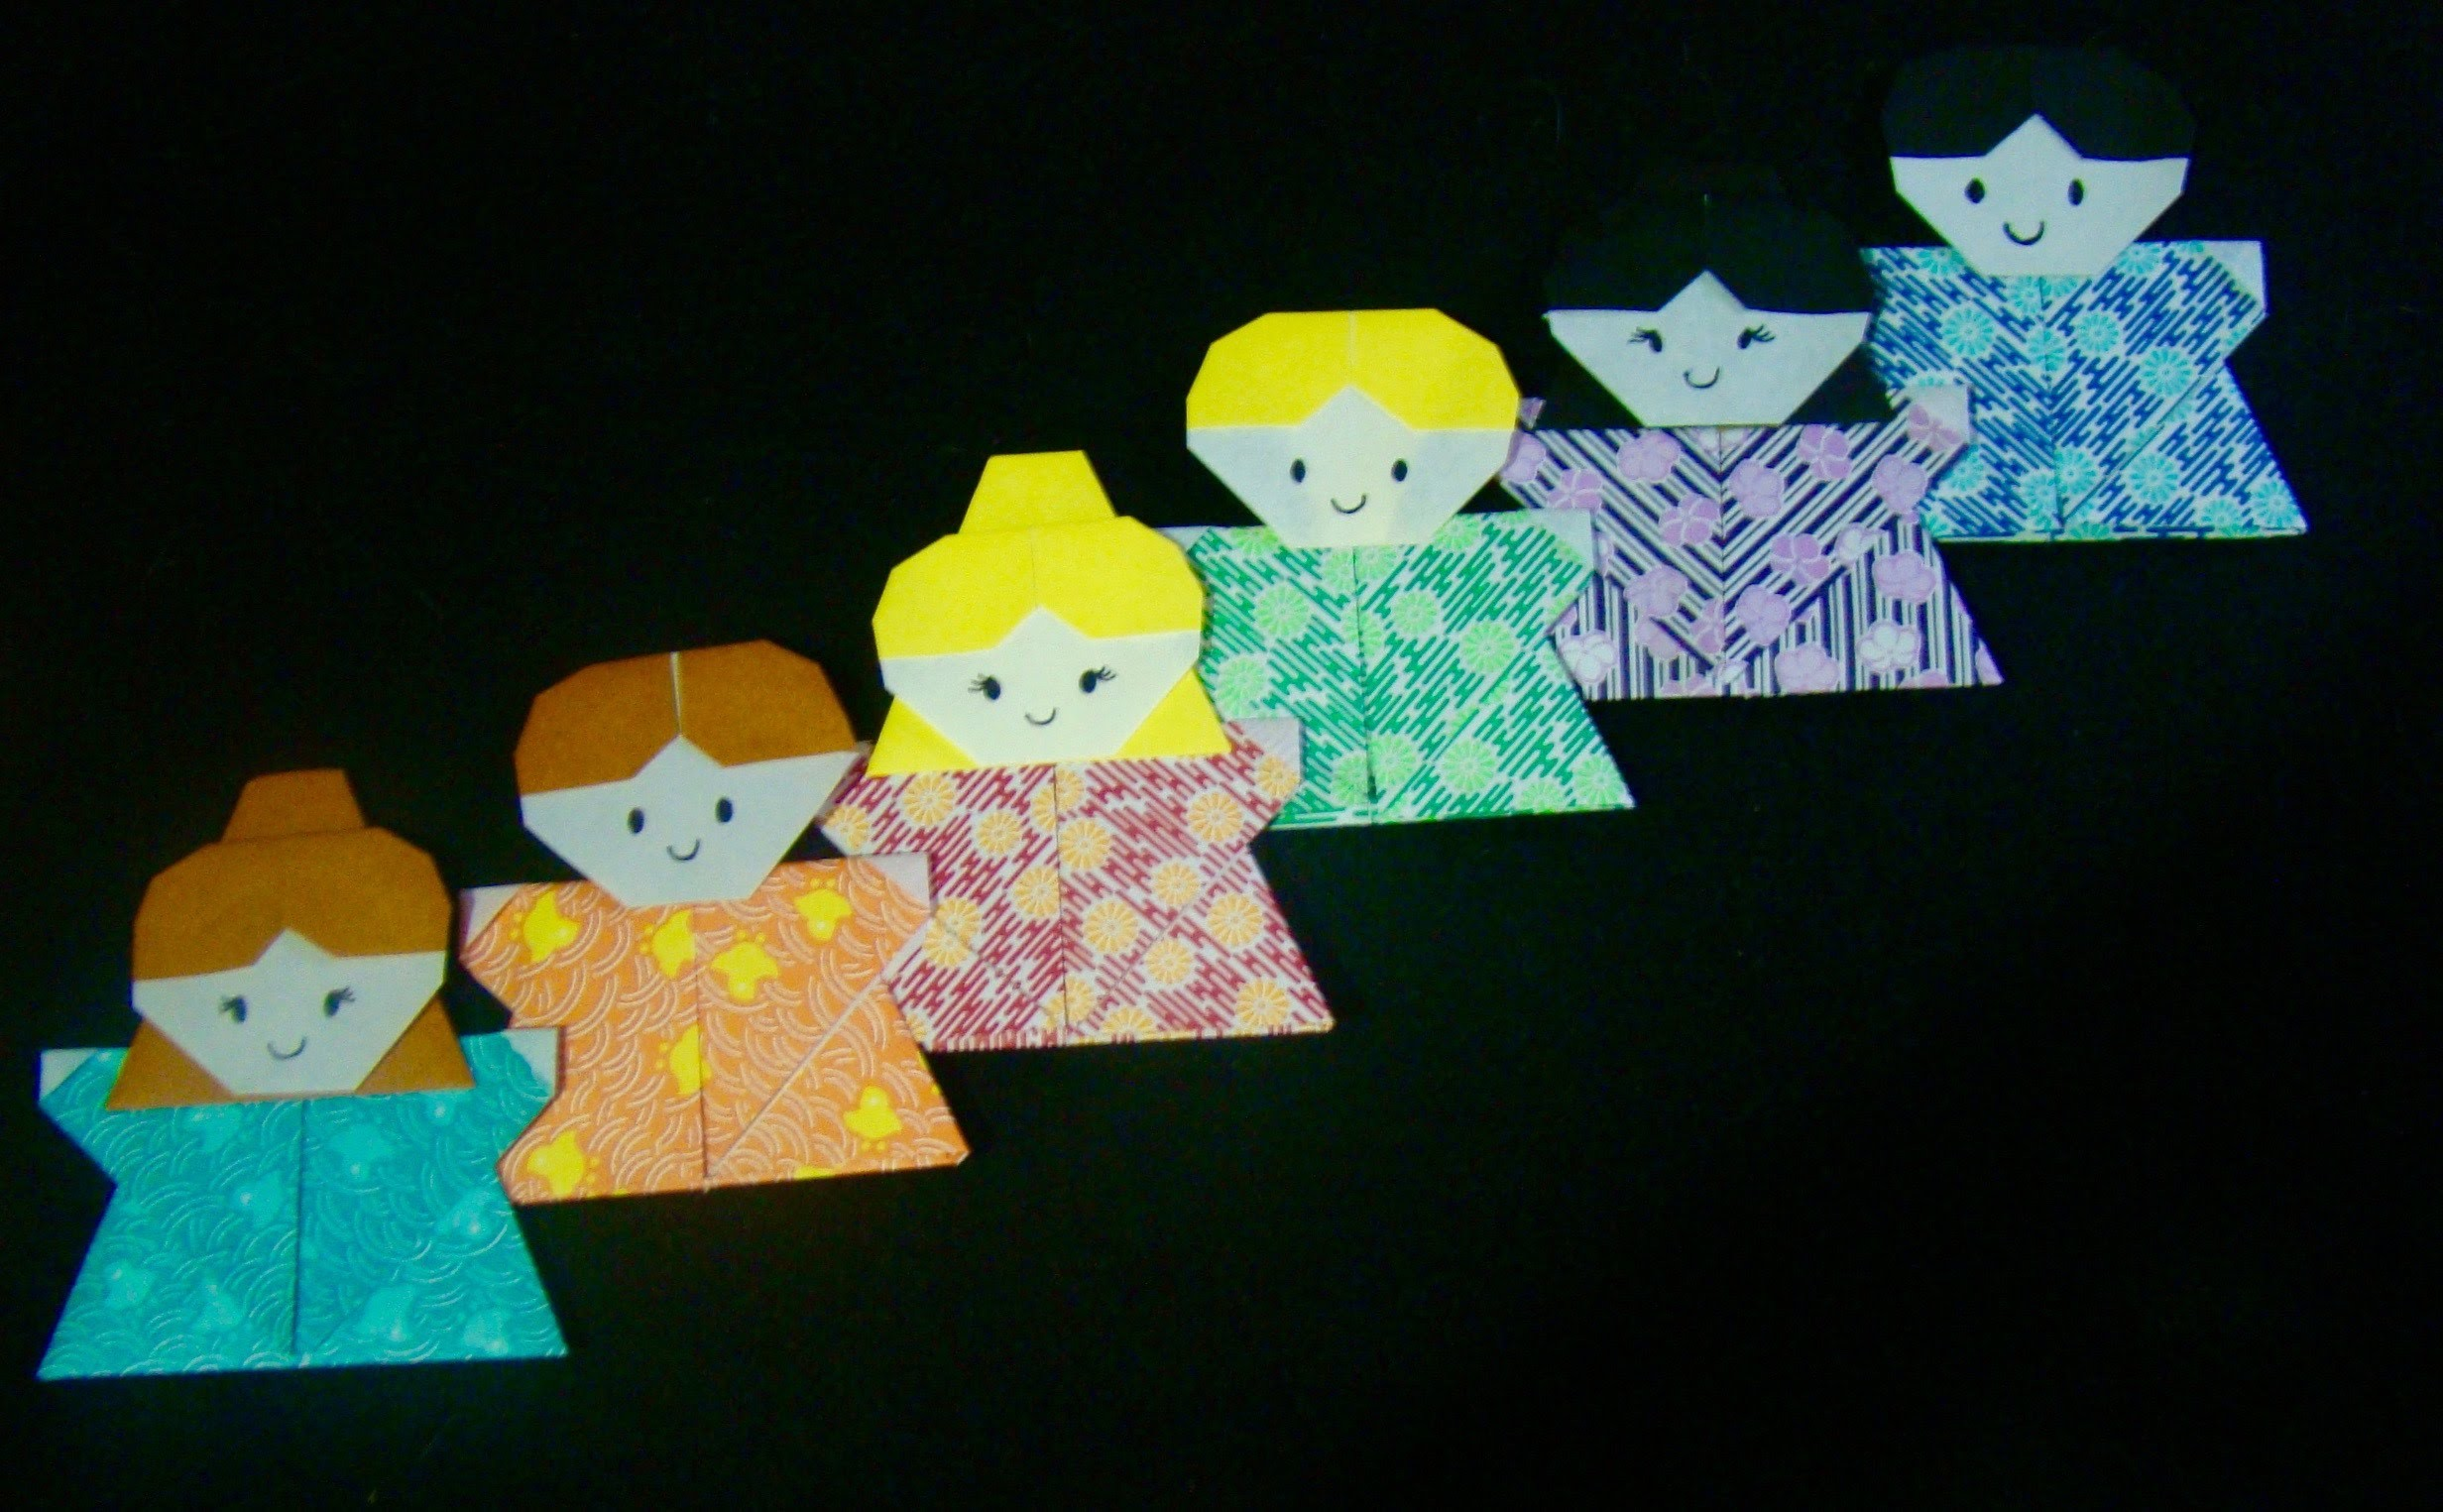 Origami Maniacs 203: Origami Boy and Girl. Ninios de Origami - photo#39